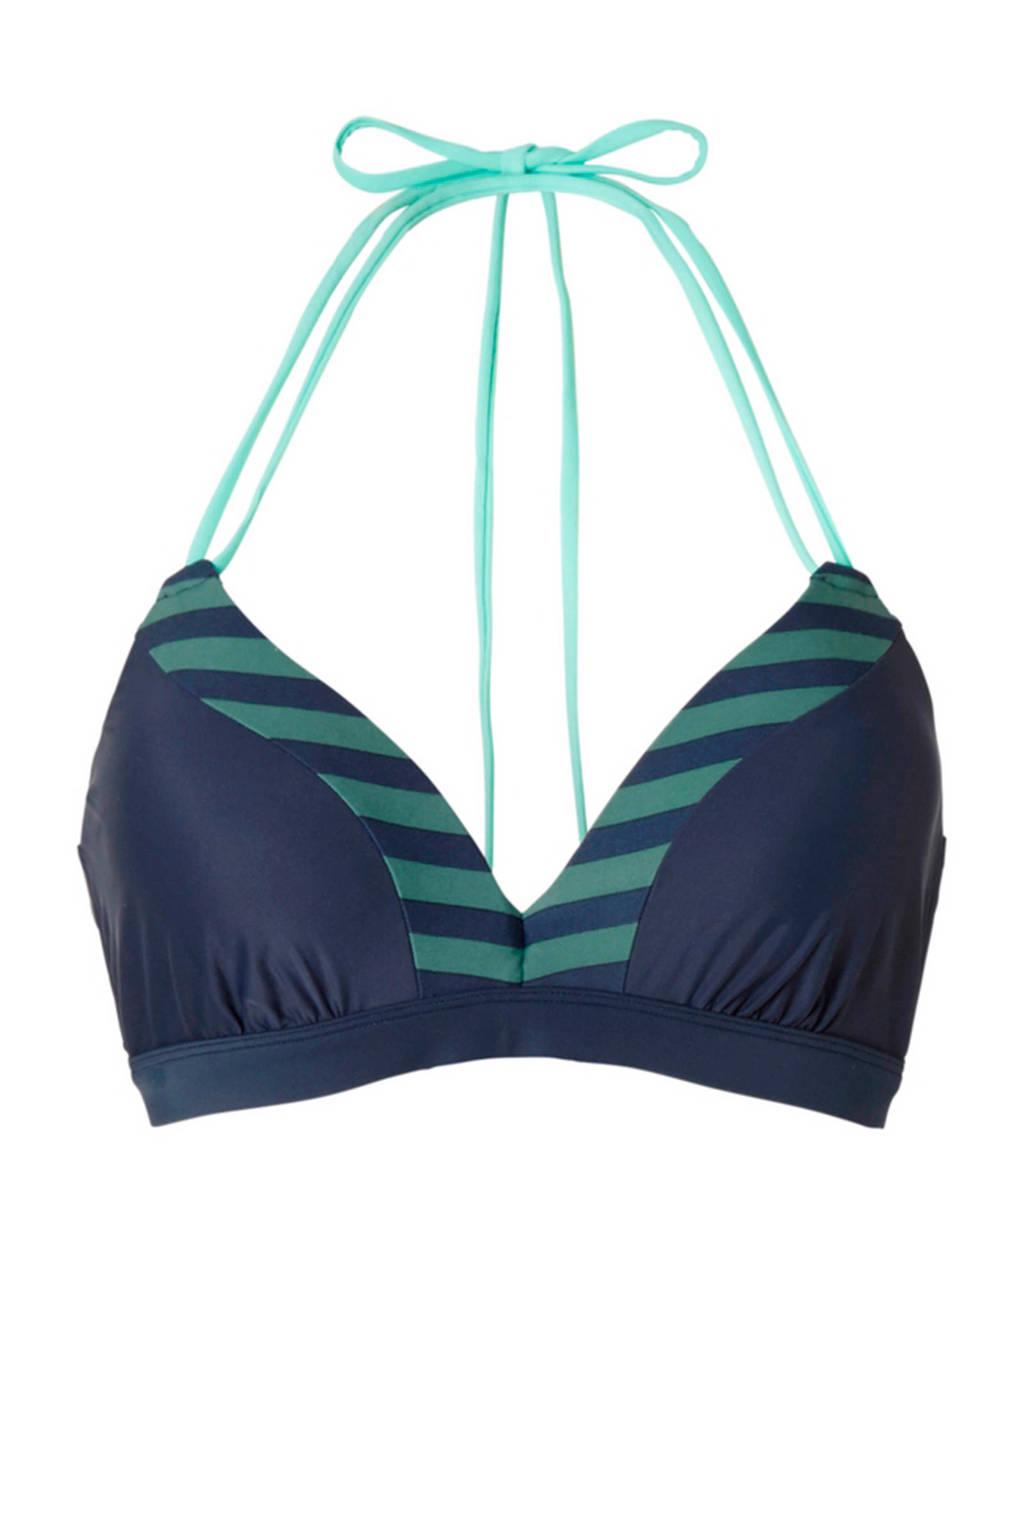 Beachlifehalter Beachlifehalter Bikinitop Bikinitop I61n6OF